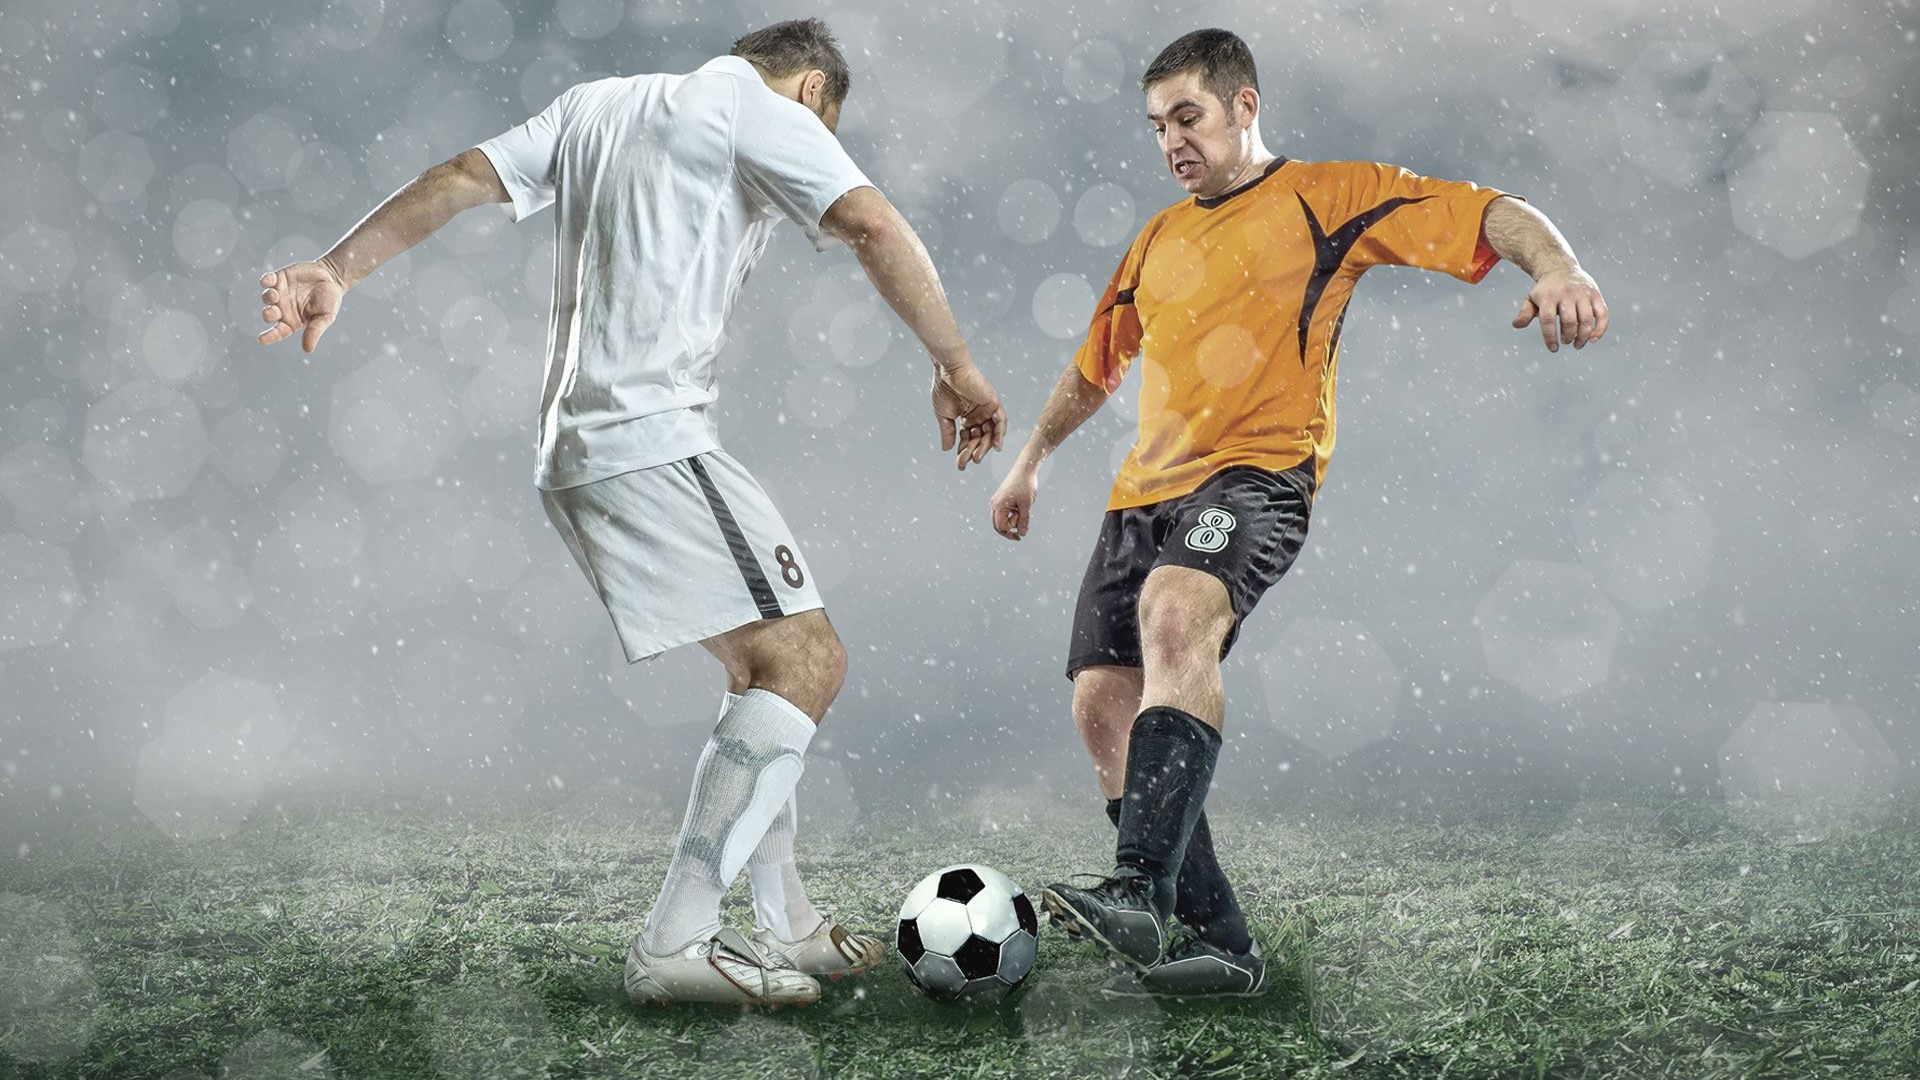 live-gloucester-rugby-vs-bristol-rugby-online